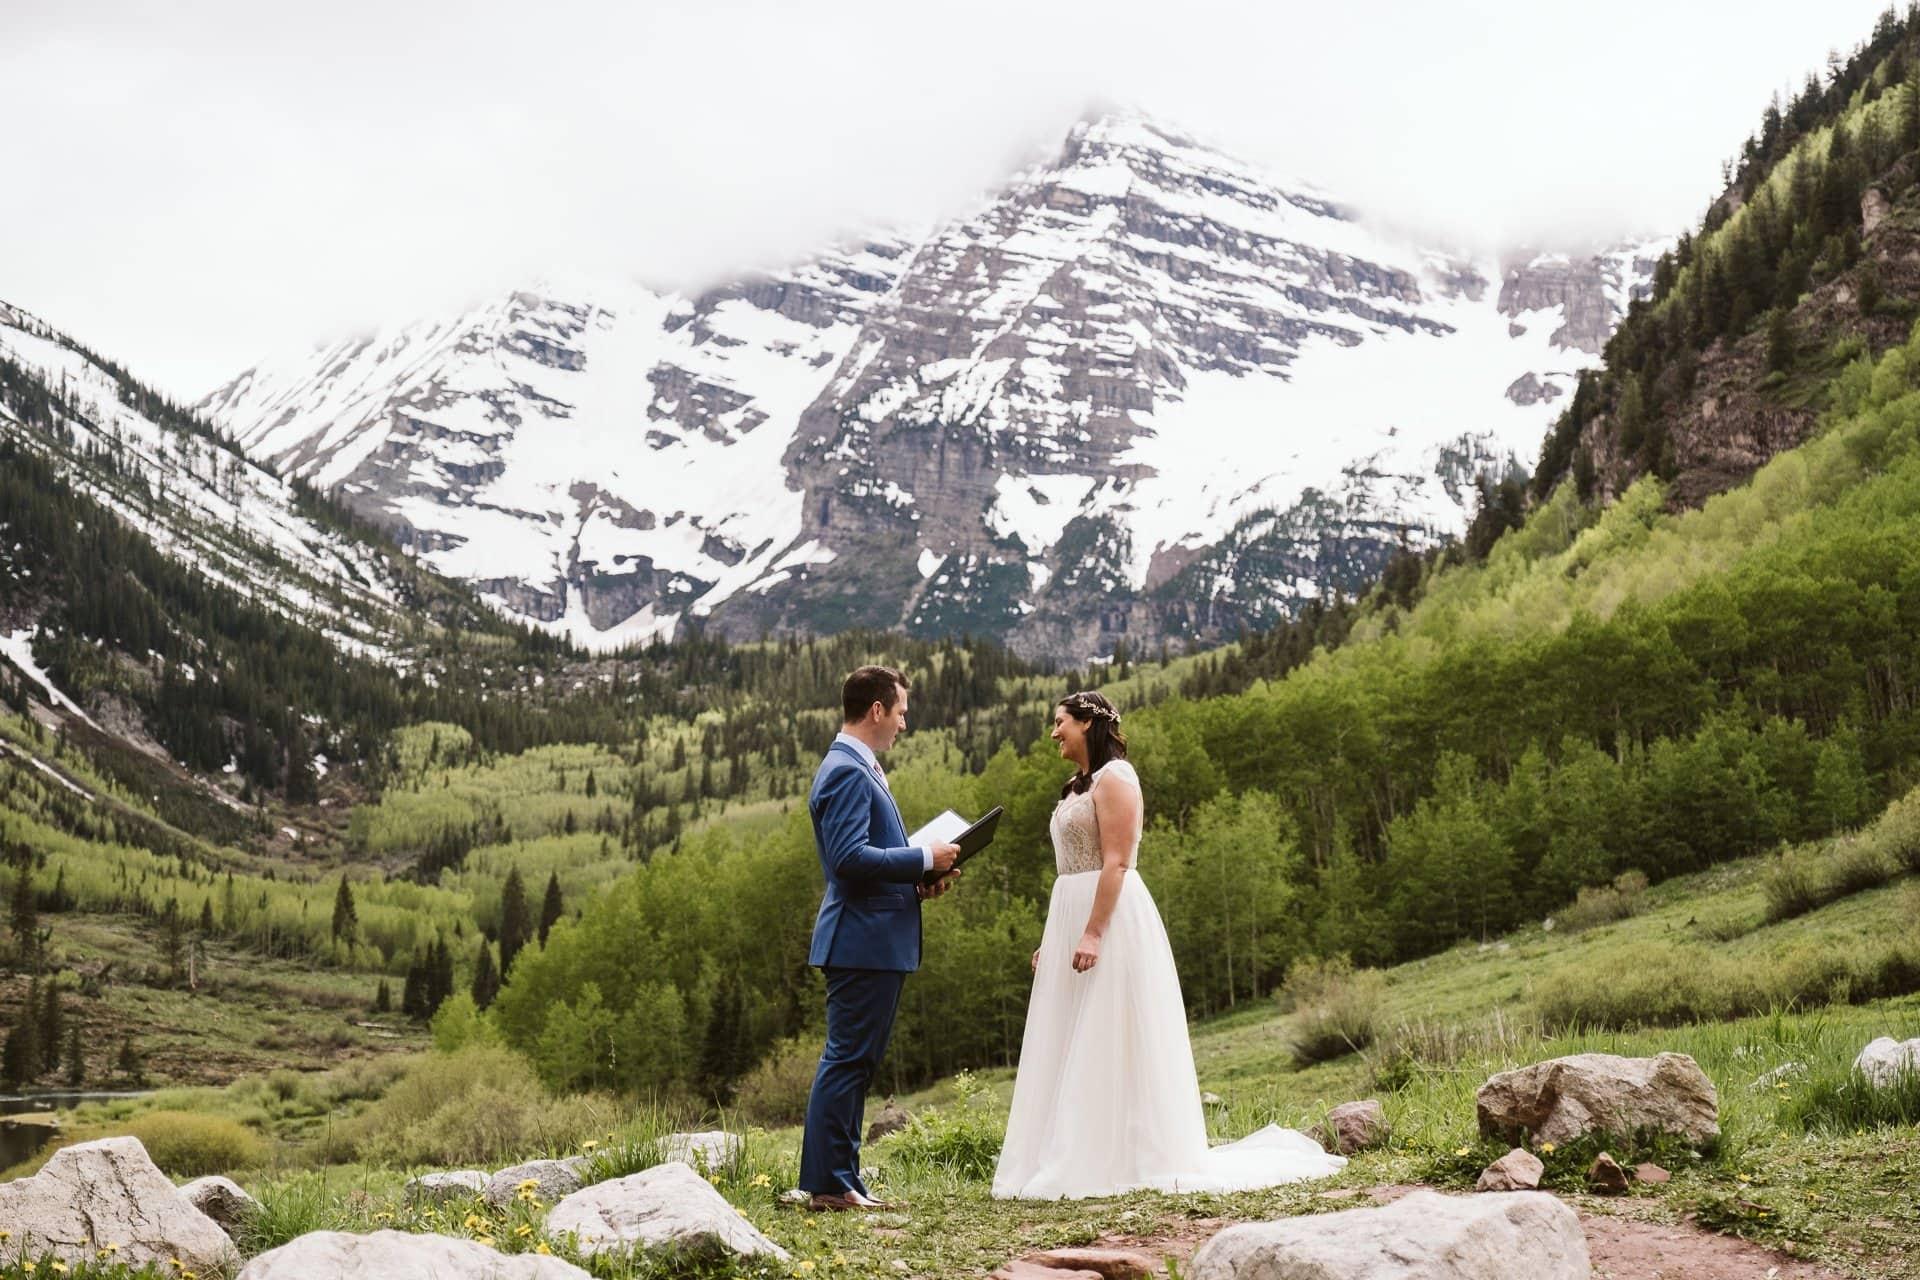 Bride and groom self-solemnize elopement at Maroon Bells in Aspen